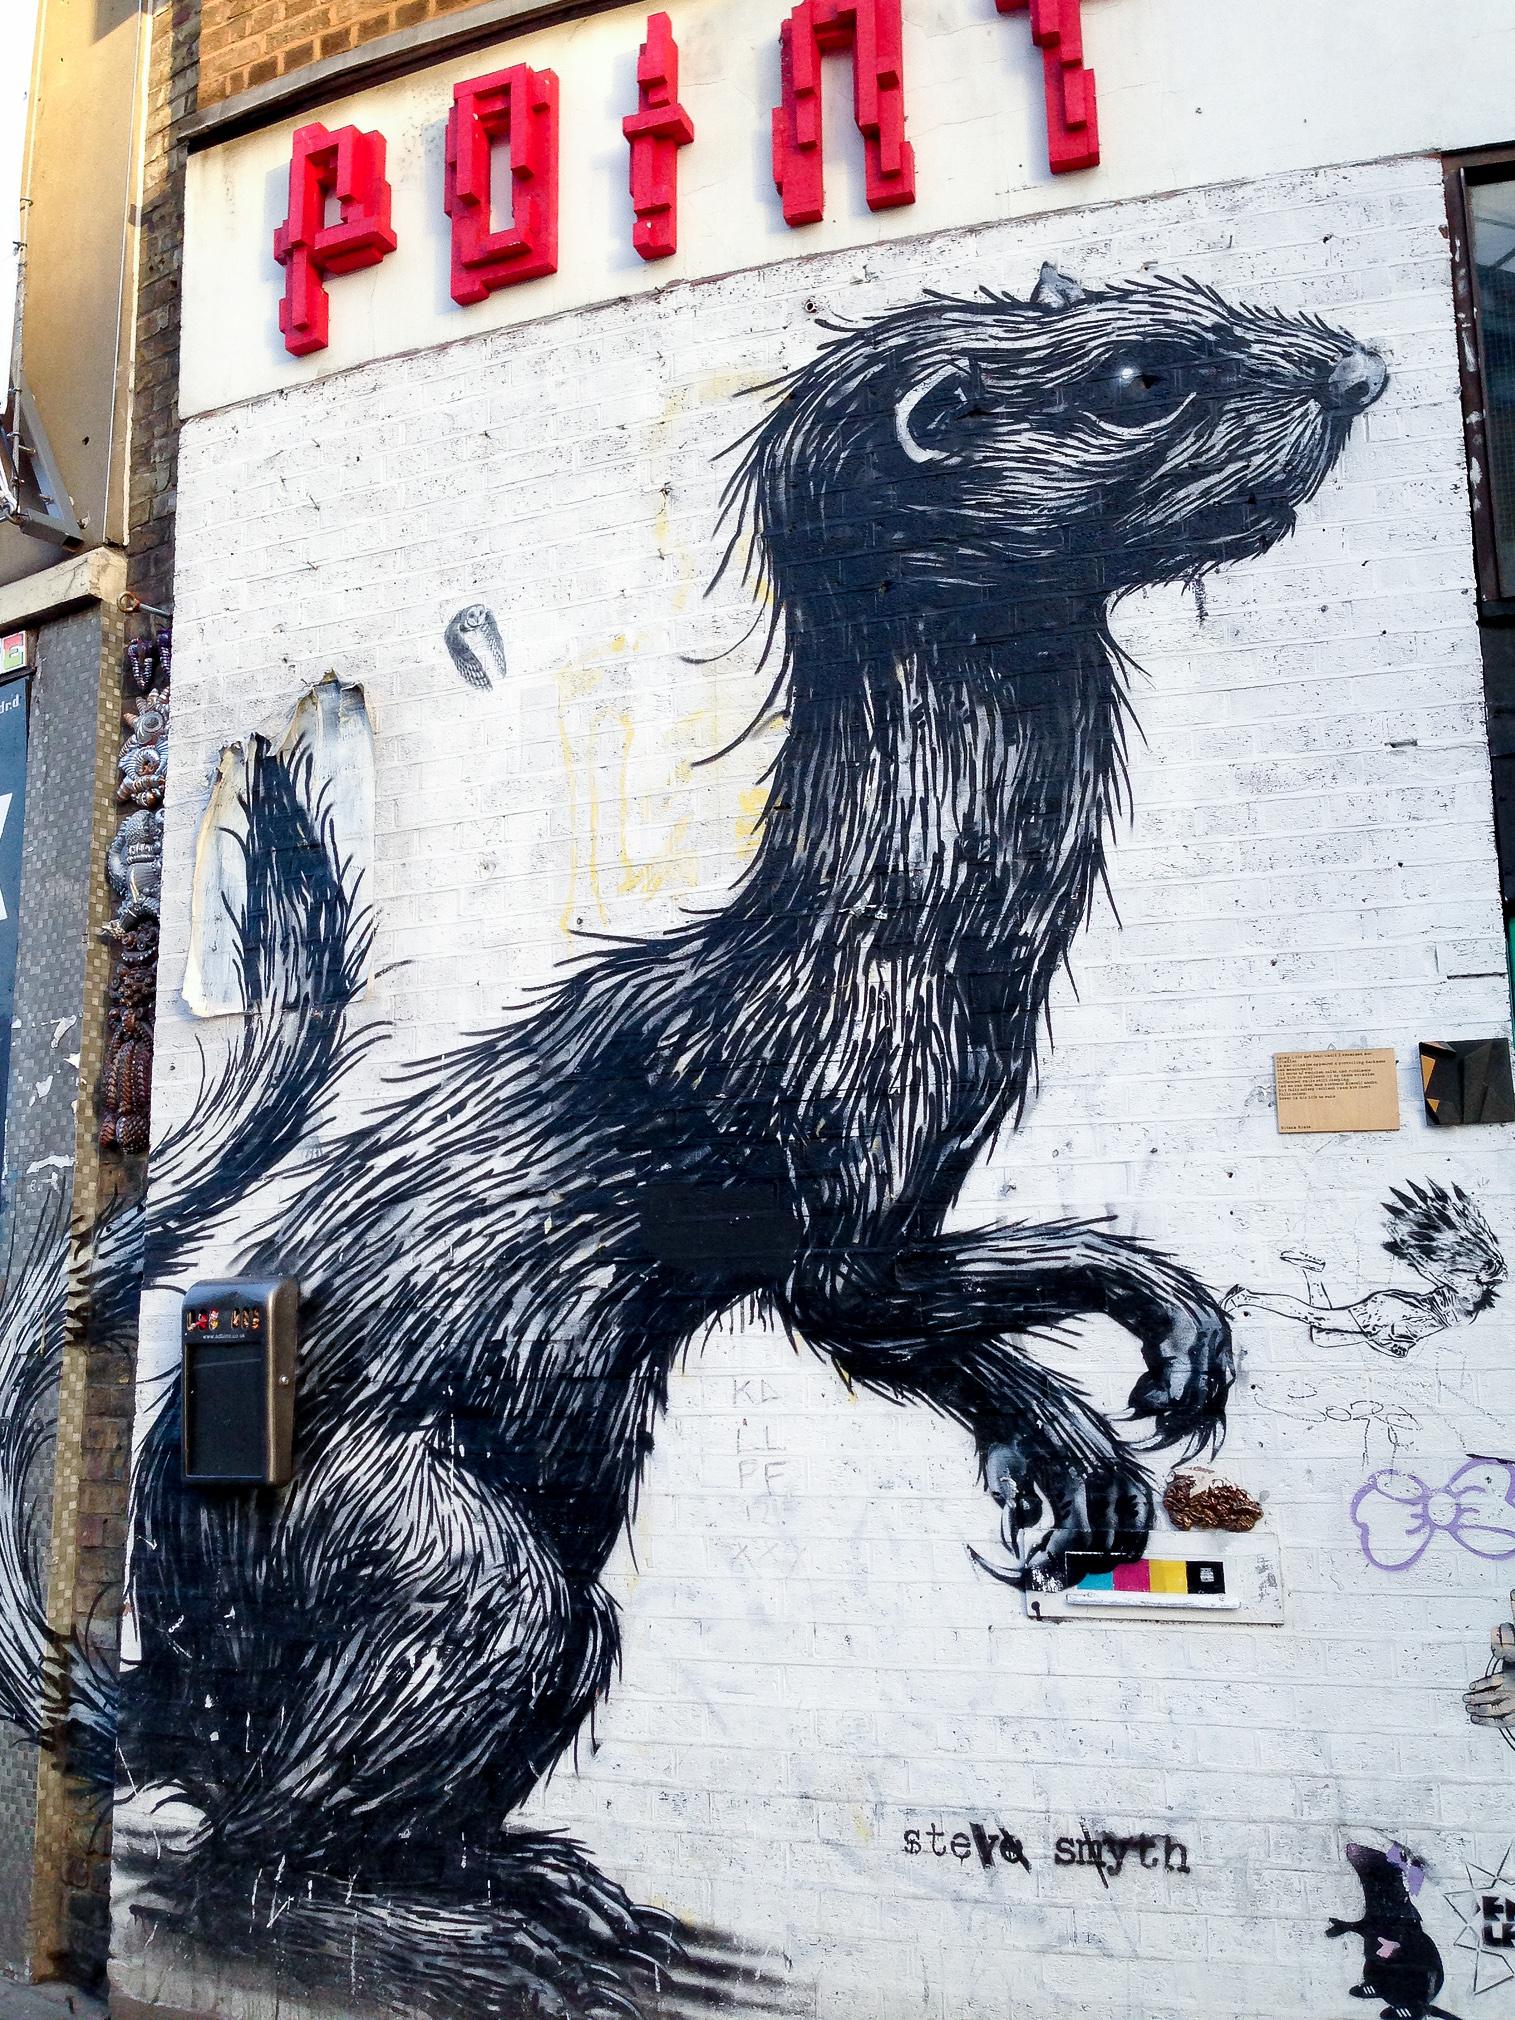 Roa's animal street art in London.